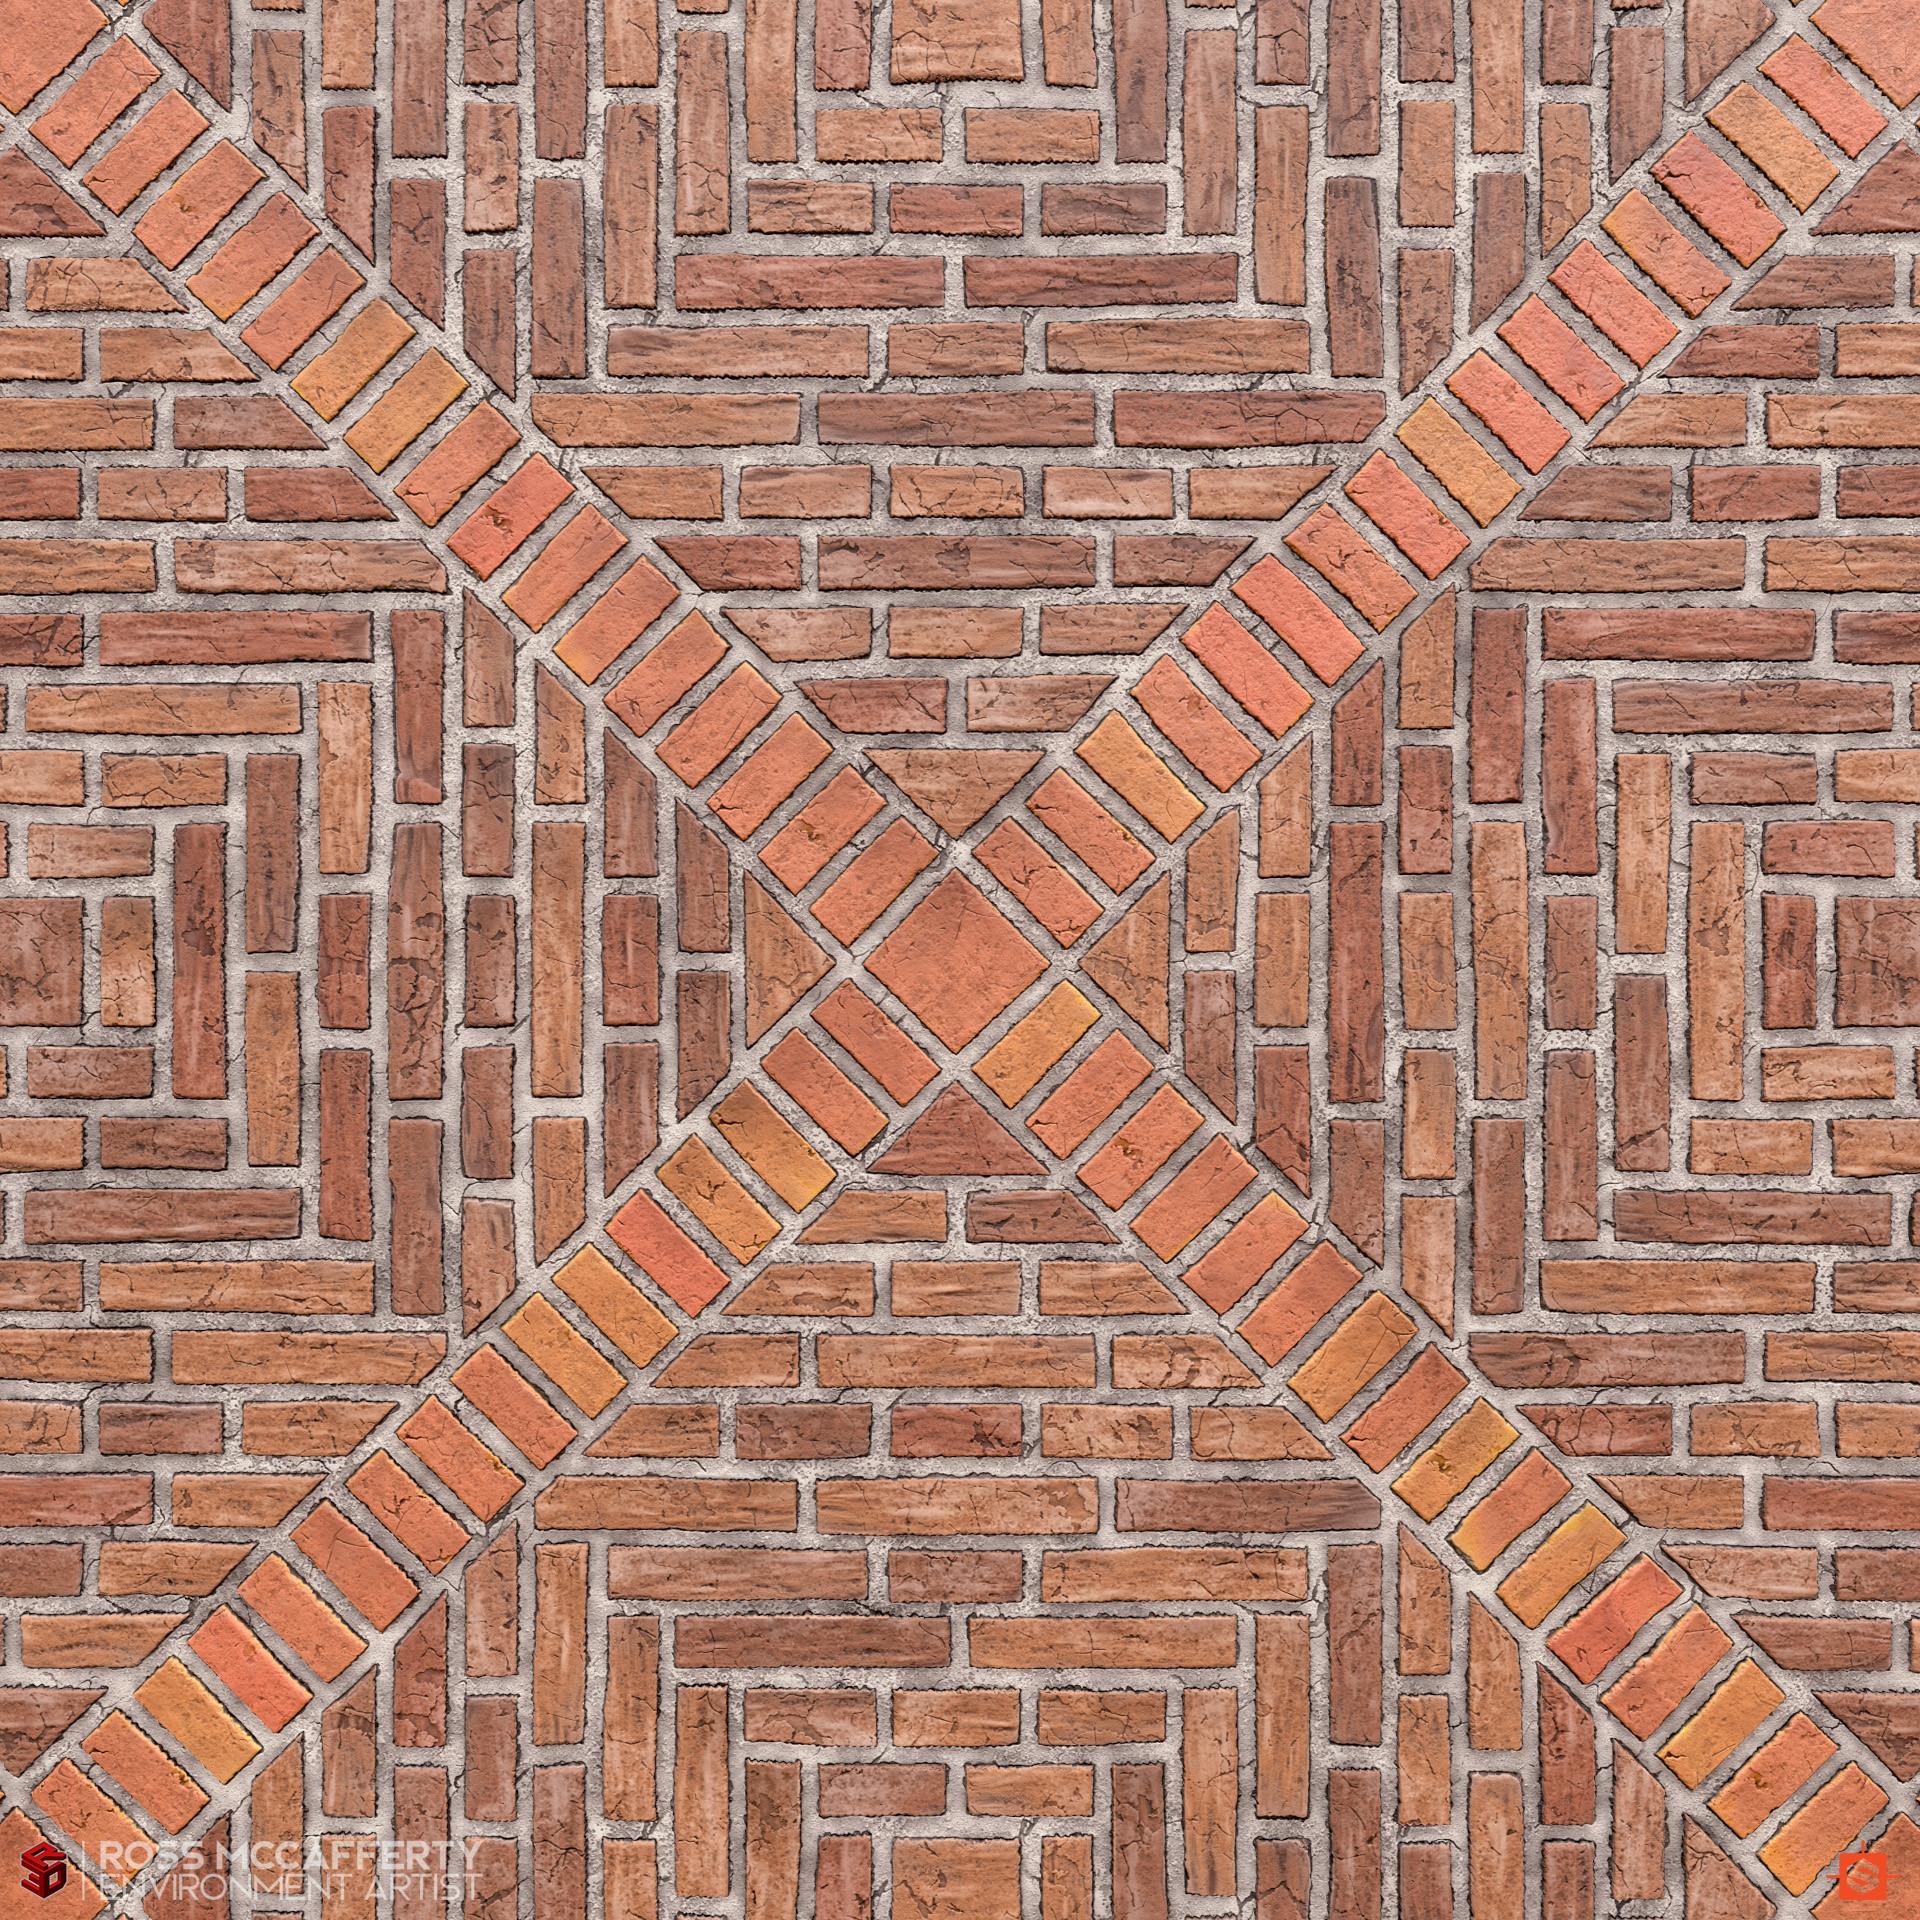 Ross mccafferty brick 04